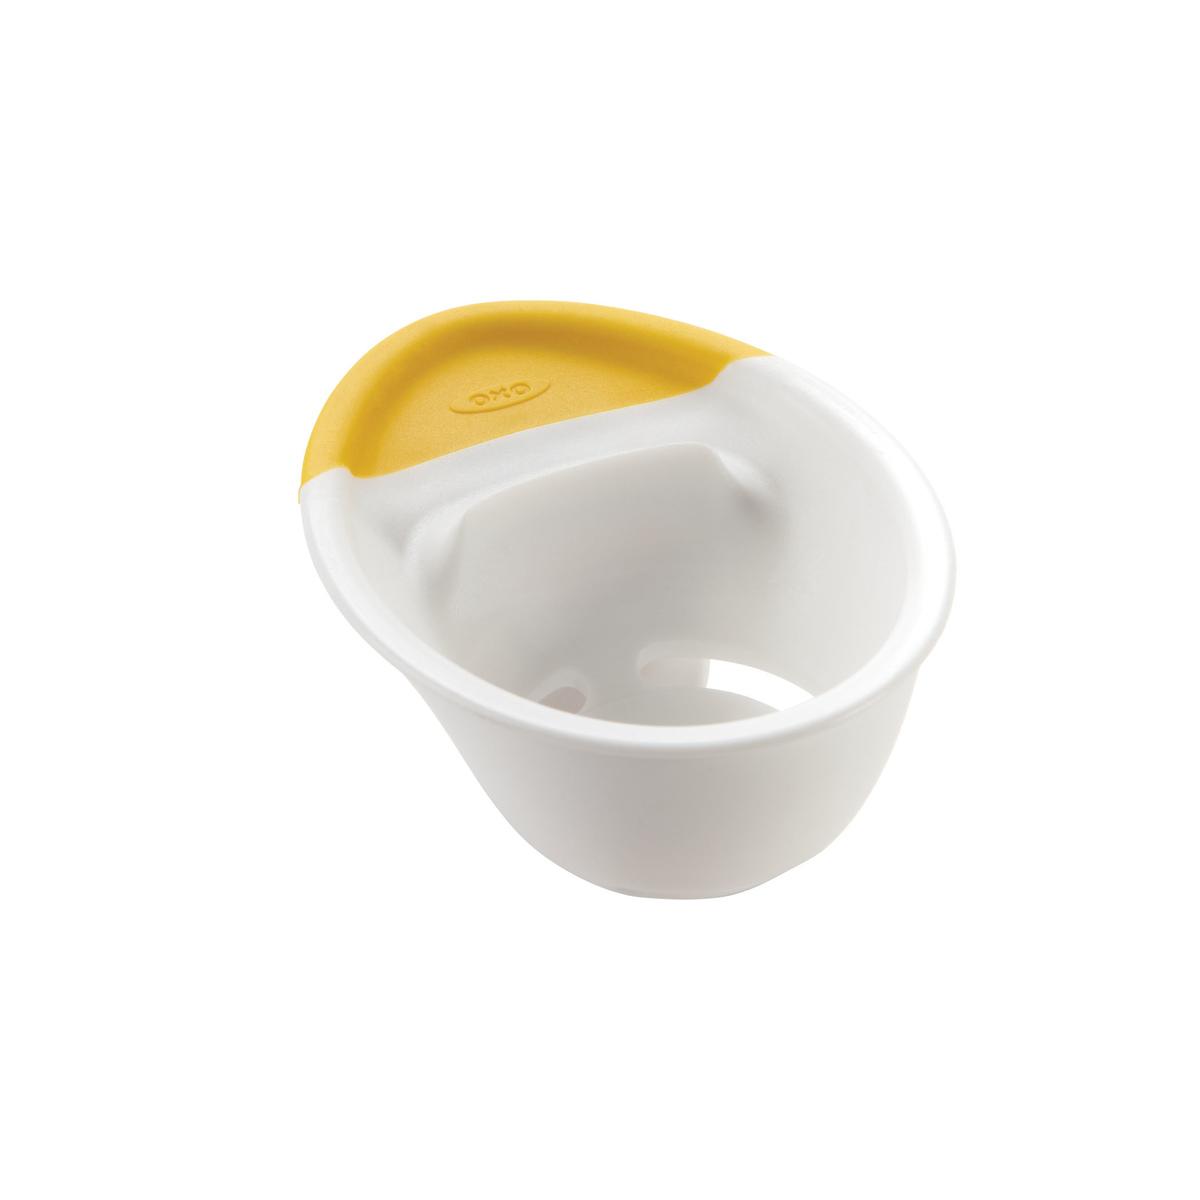 Онлайн каталог PROMENU: Сепаратор для яиц OXO COOKING UTENSILS, 4х12х22 см, белый OXO 1147780